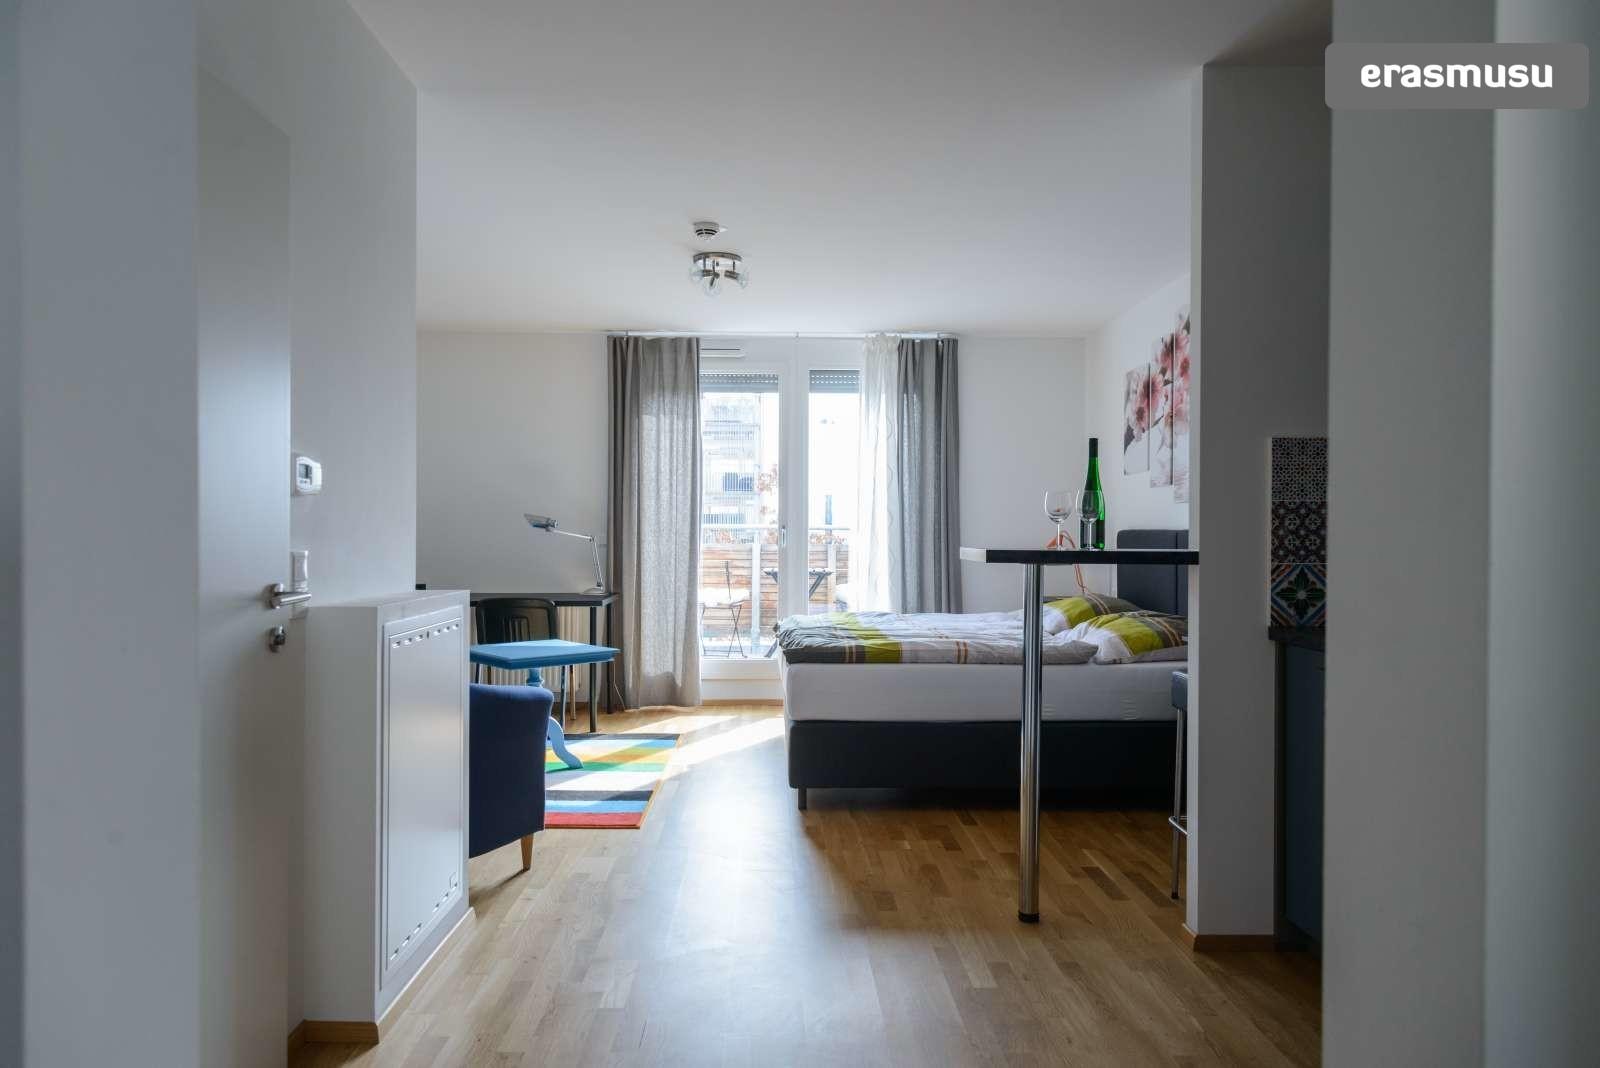 spacious-studio-apartment-rent-aspern-area-donaustadt-eb5f22b6f6